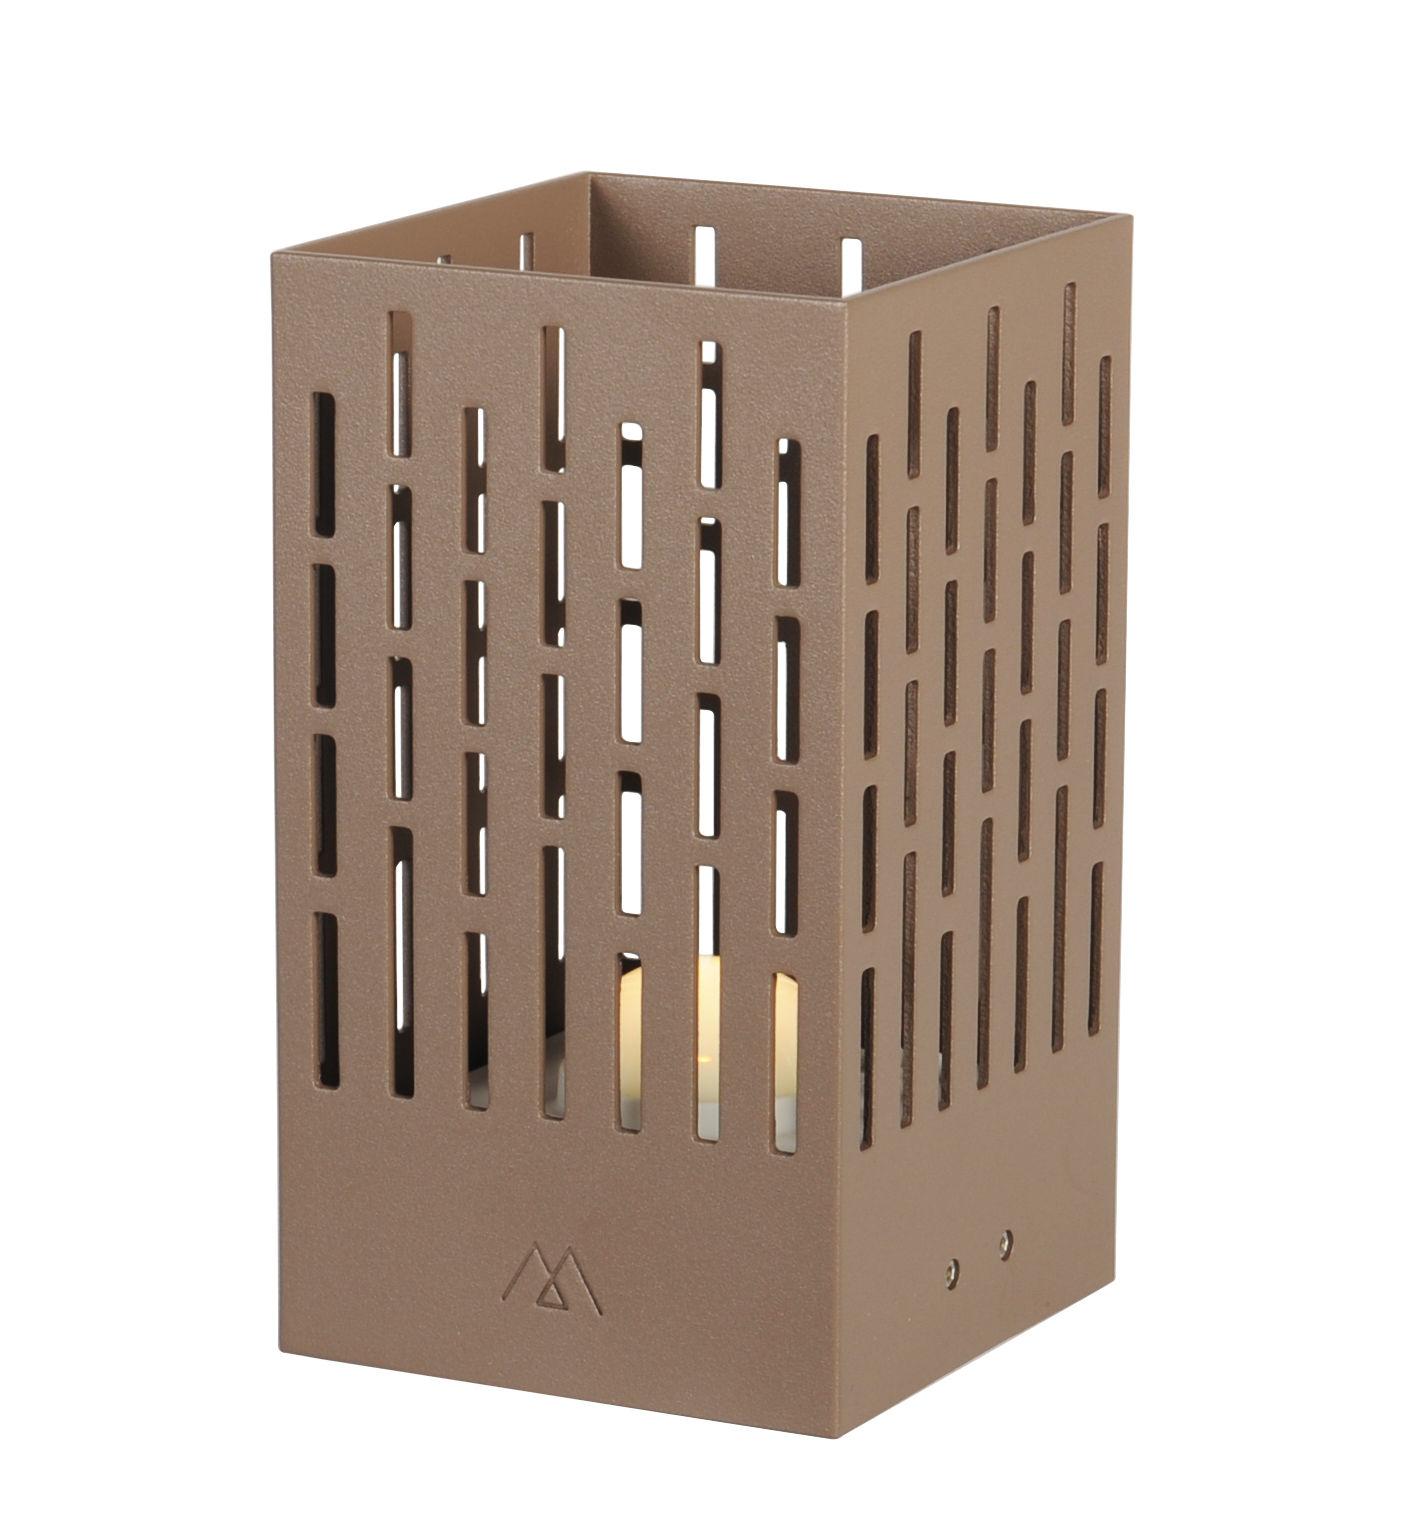 la lampe pose 04 solar lamp led wireless coffee by maiori. Black Bedroom Furniture Sets. Home Design Ideas